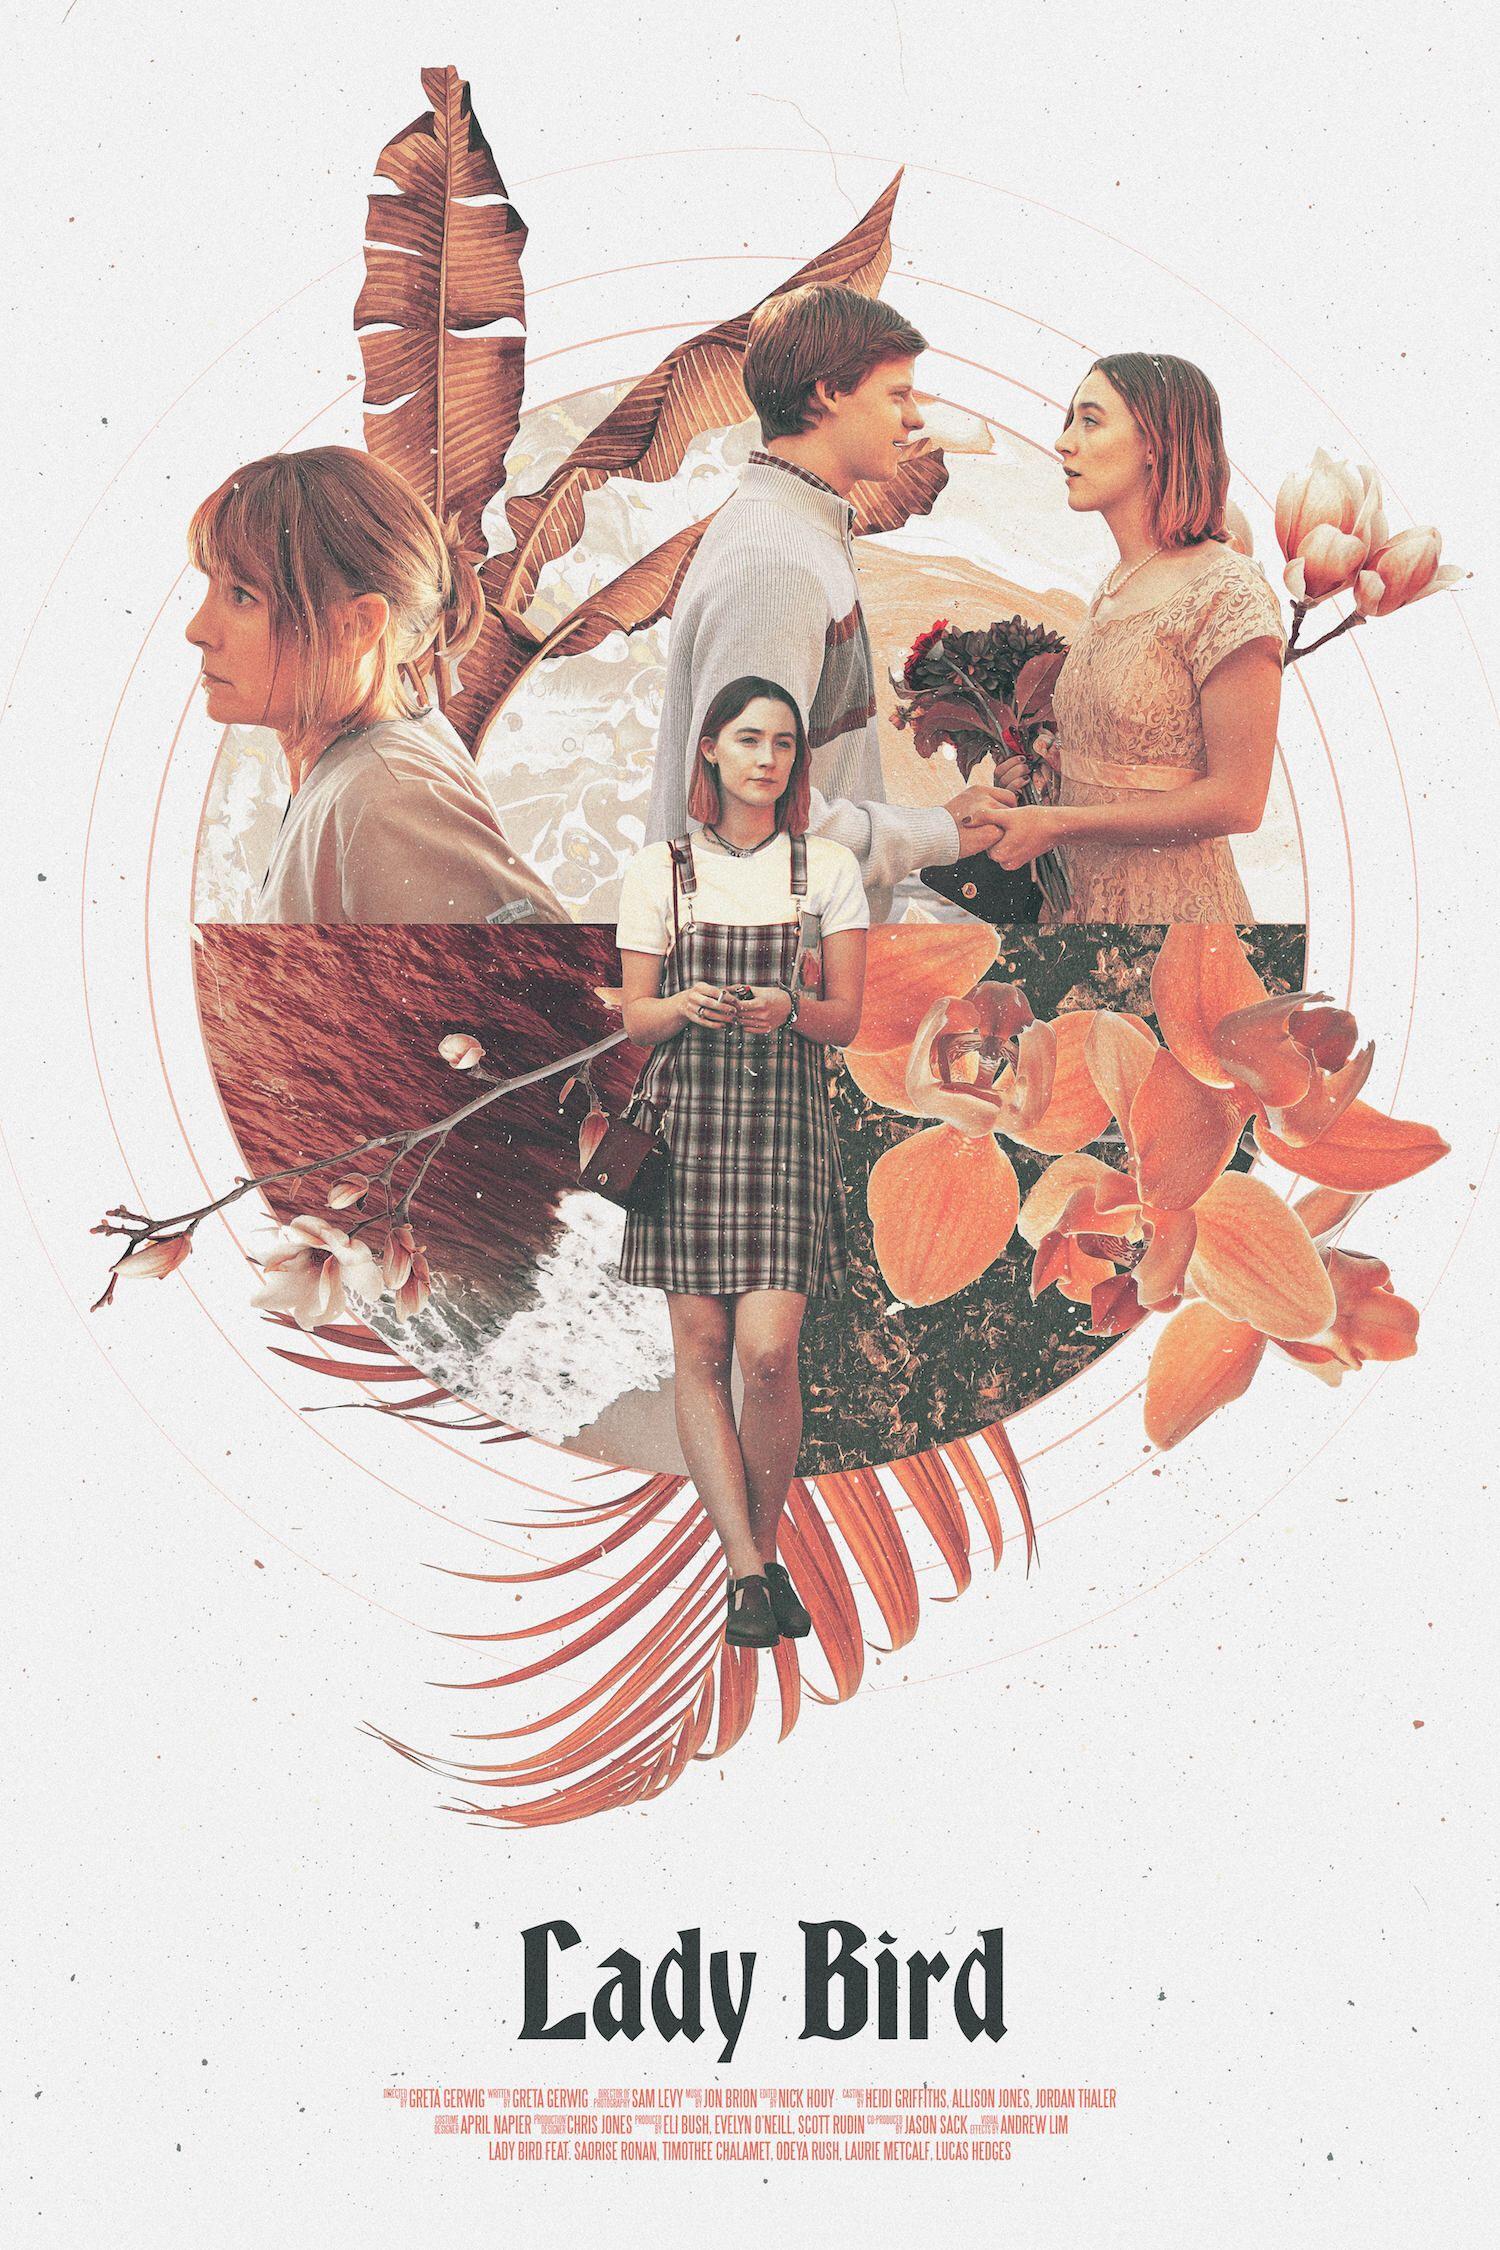 Lady Bird Poster • Alternative Movie Poster • RetroVintage Movie Poster • Retro Style Graphic